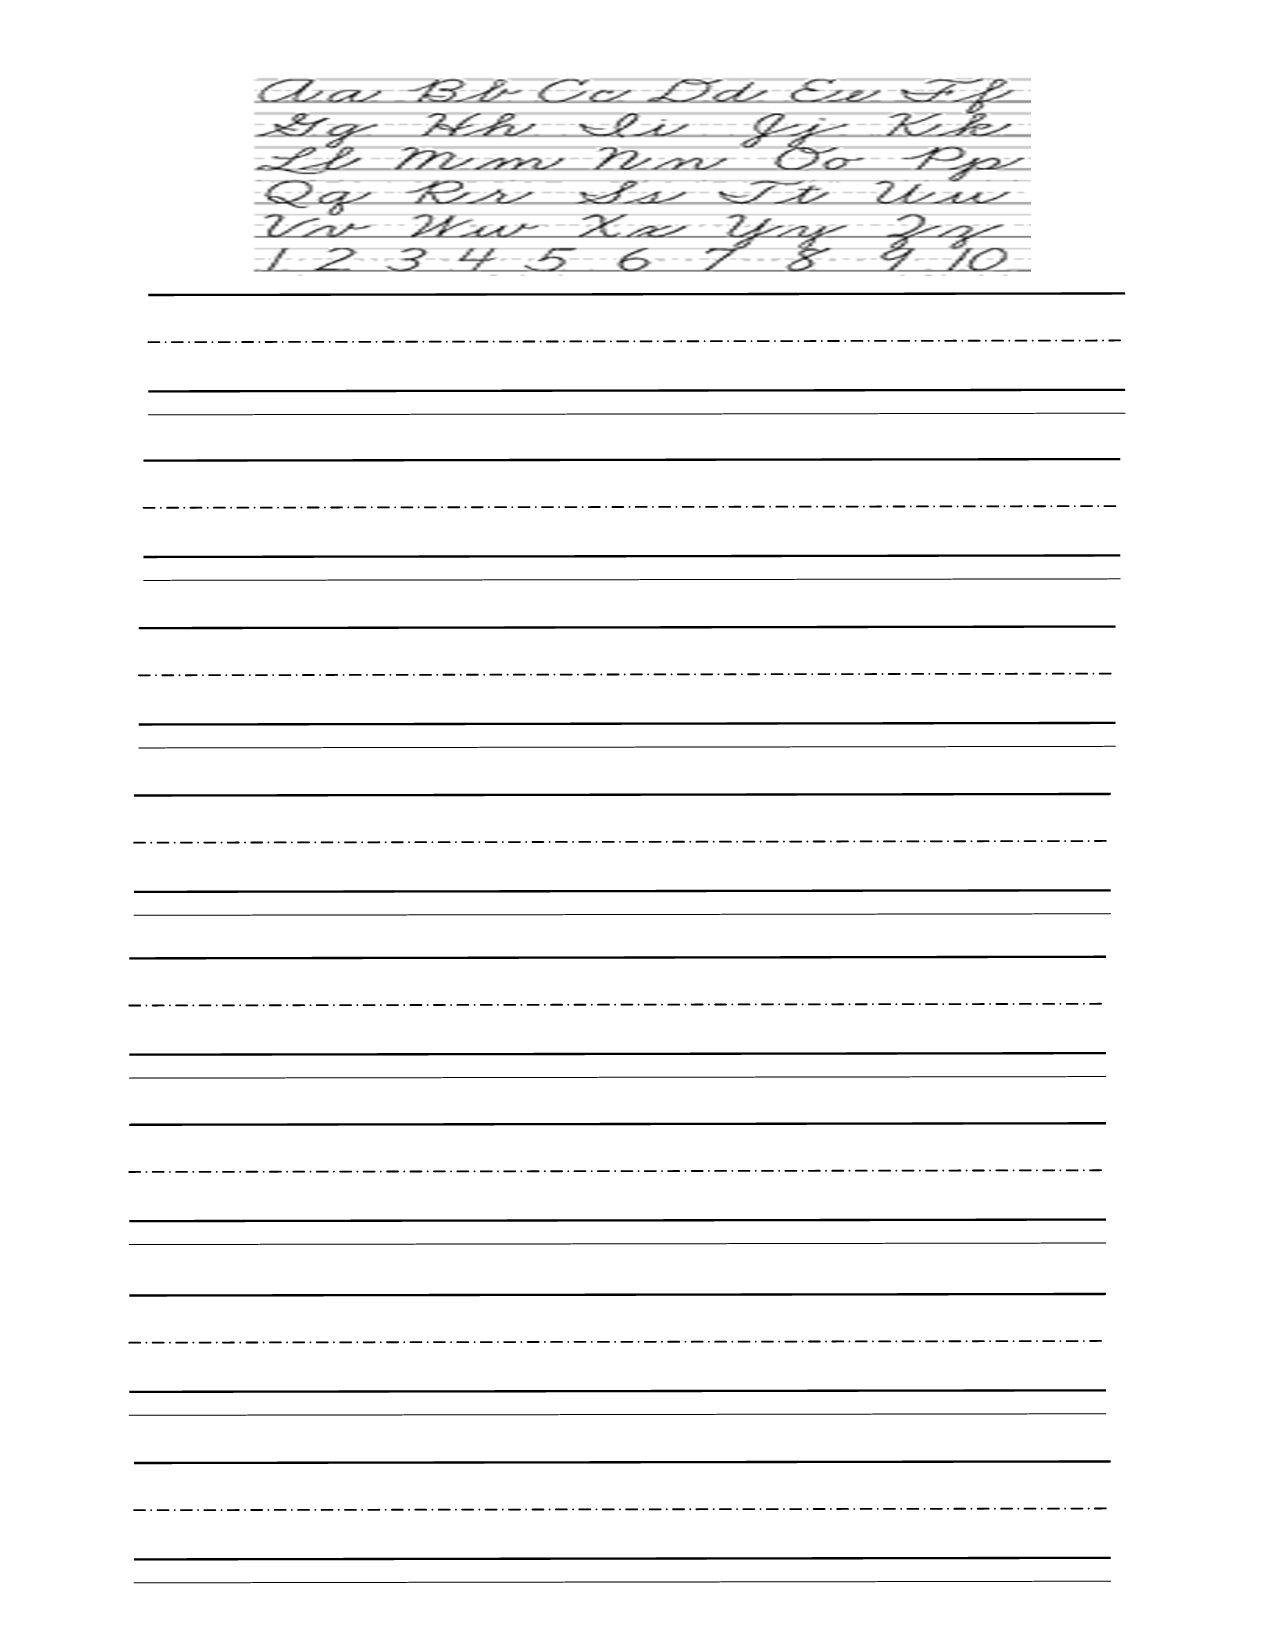 Printable Practice Cursive Writing Worksheets